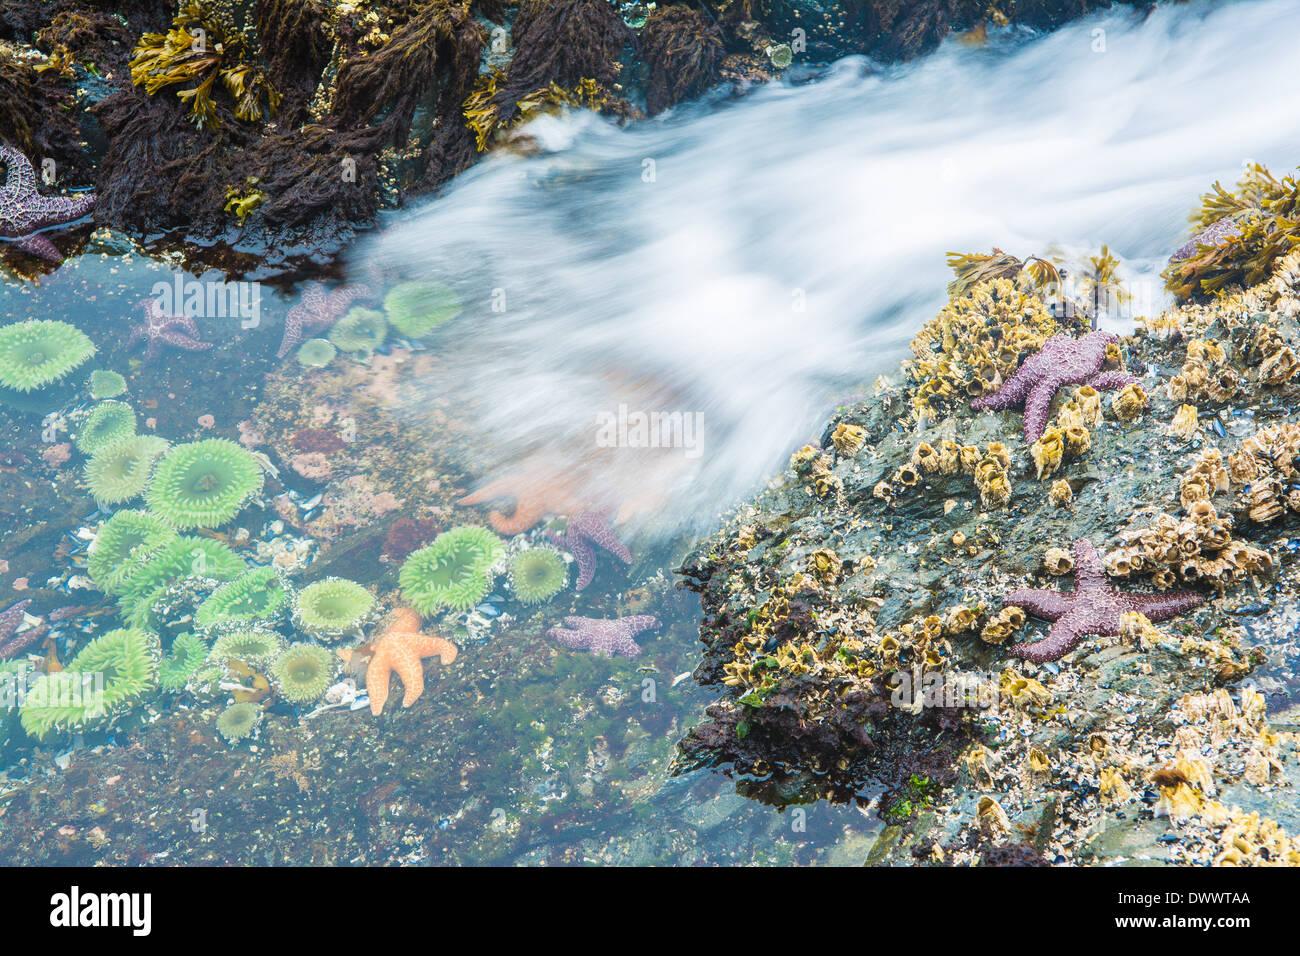 Starfish and anemones, Bamdoroshni Island off the coast of Sitka, Alaska - Stock Image